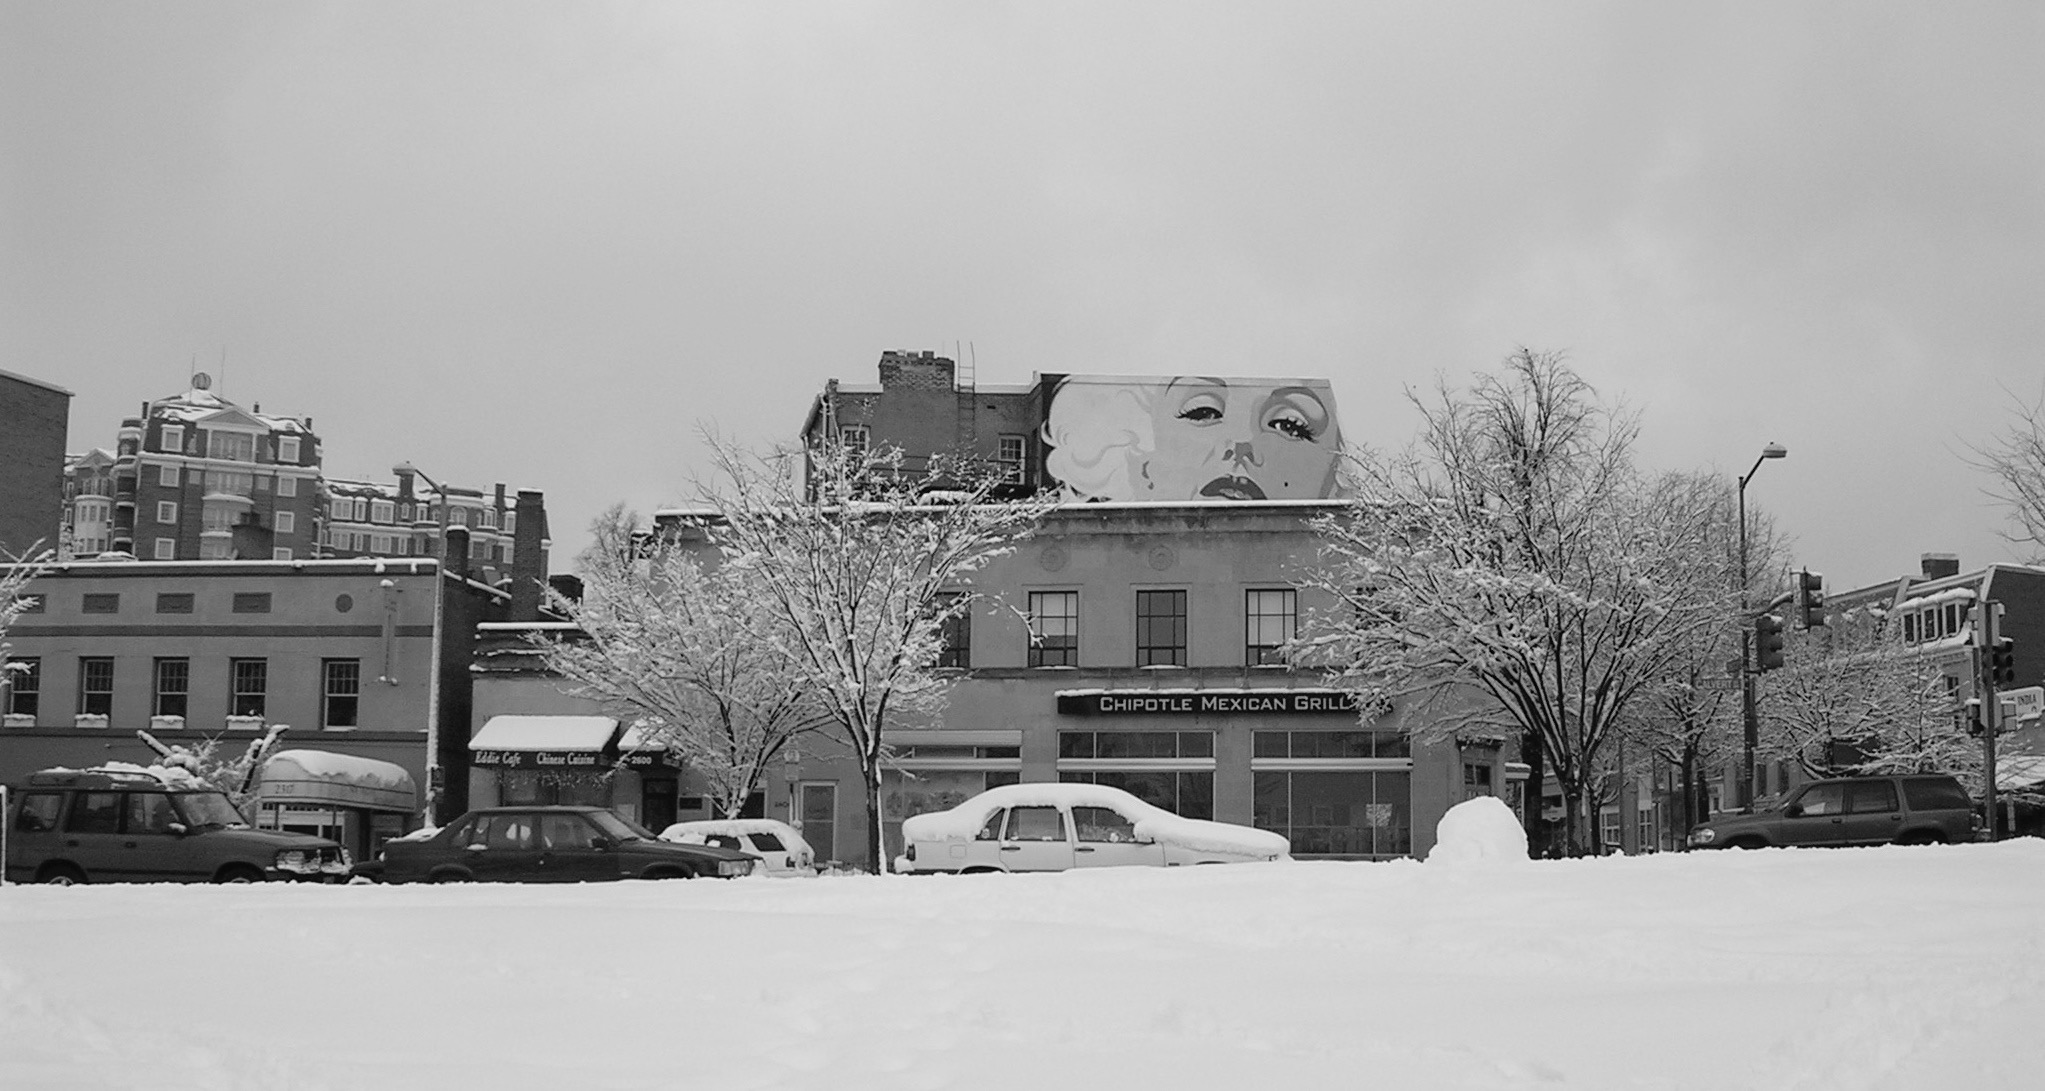 snowy-winter-streets-washington-dc